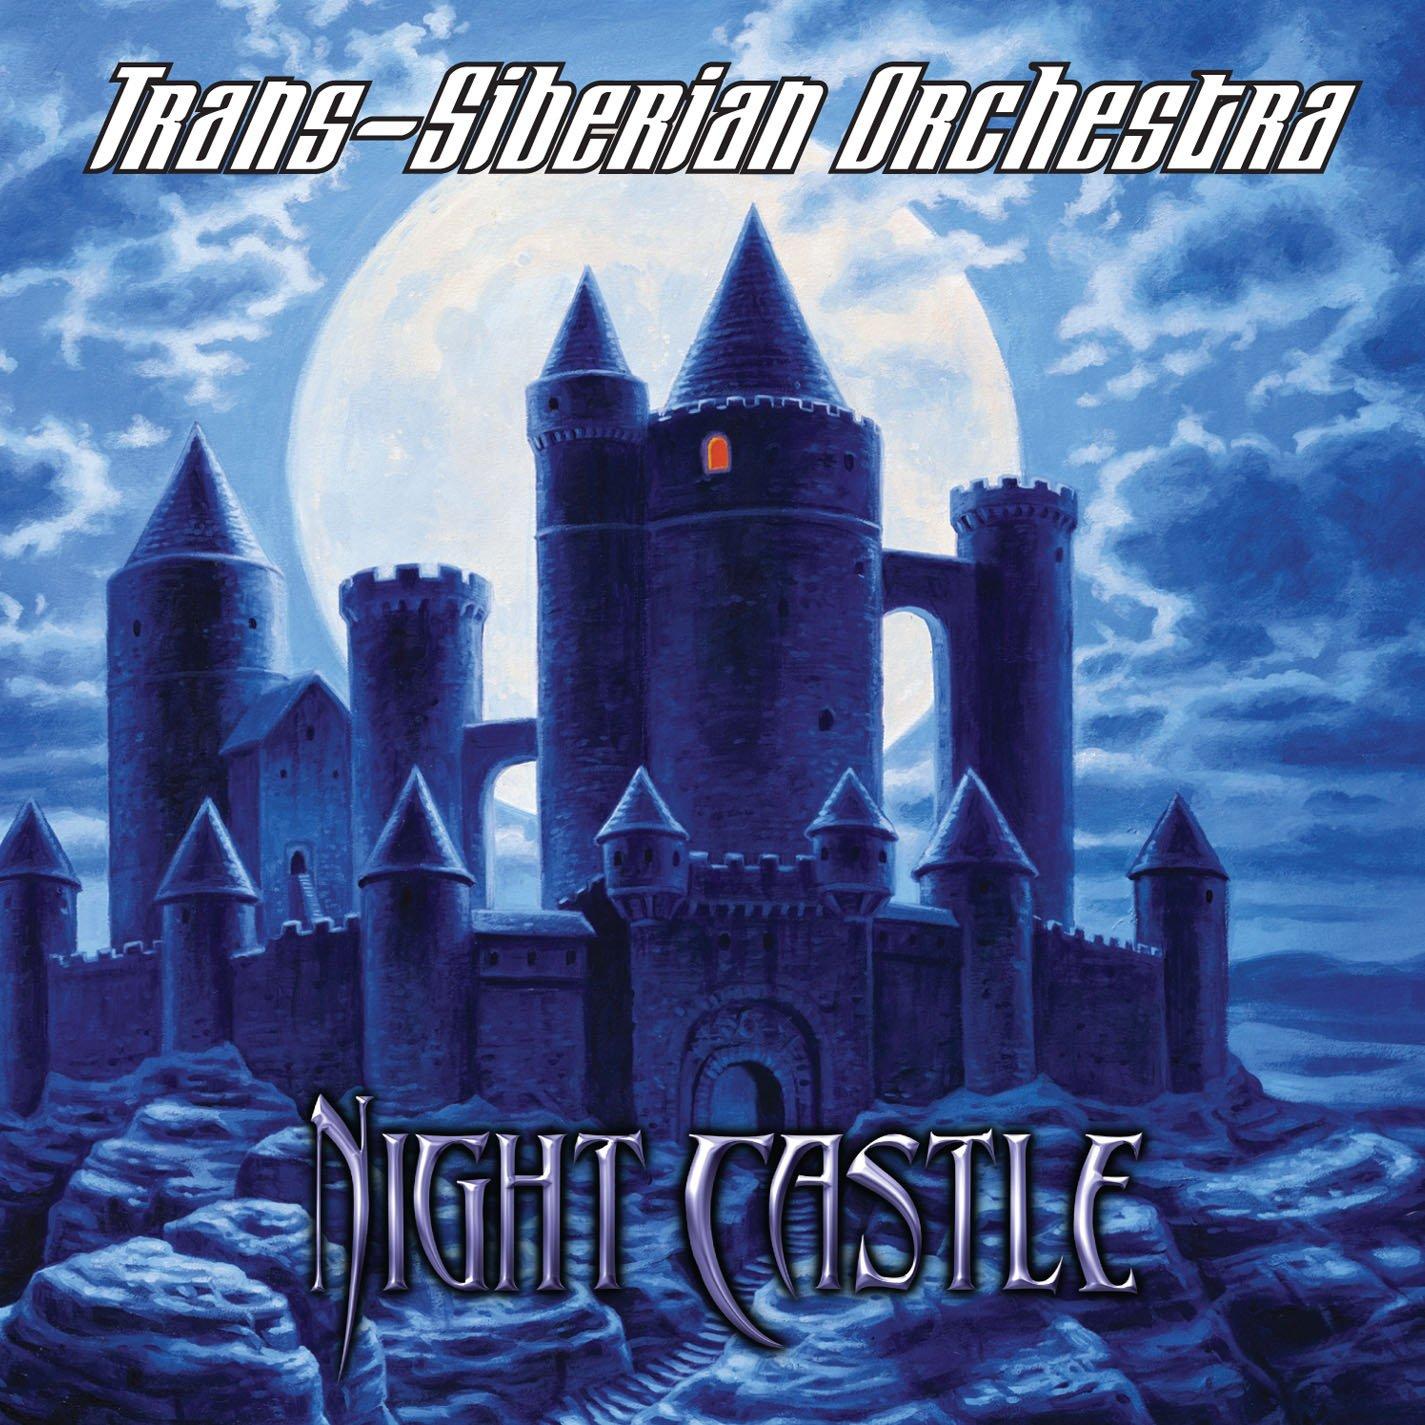 Trans-Siberian Orchestra - Night Castle - Amazon.com Music